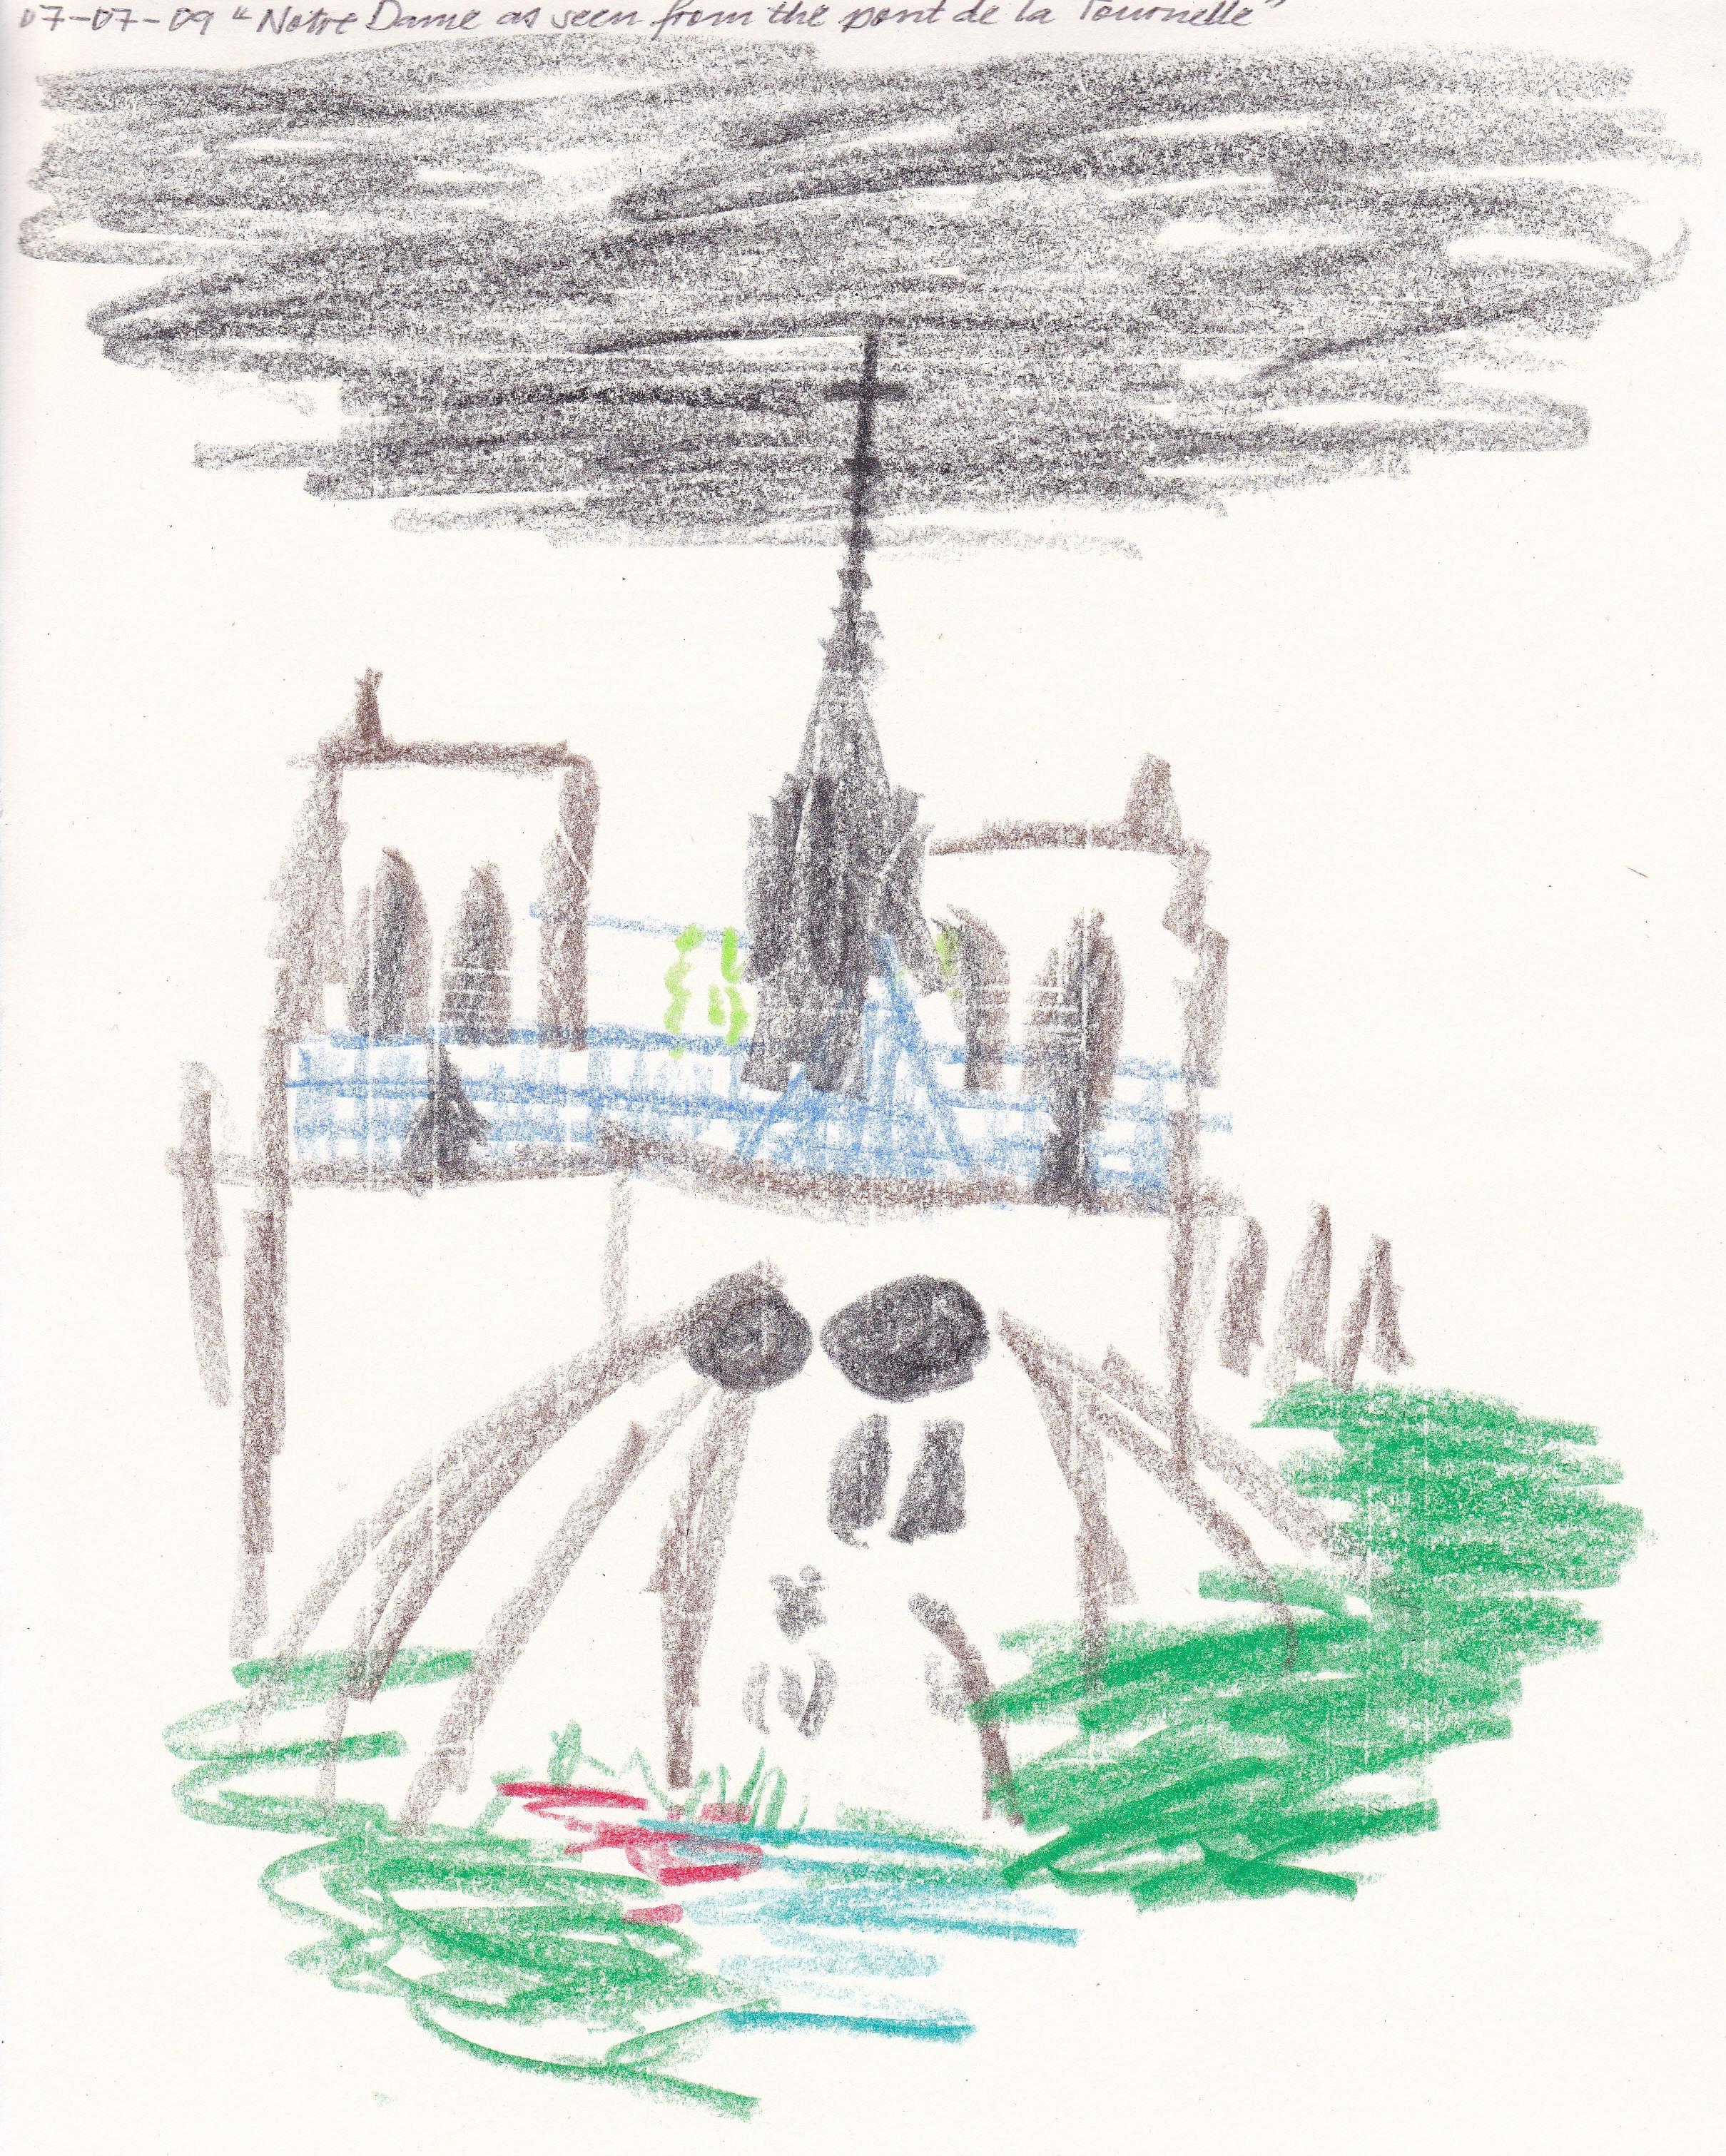 Notre-Dame as seen from the pont de la Tournelle, by Dean Kyte